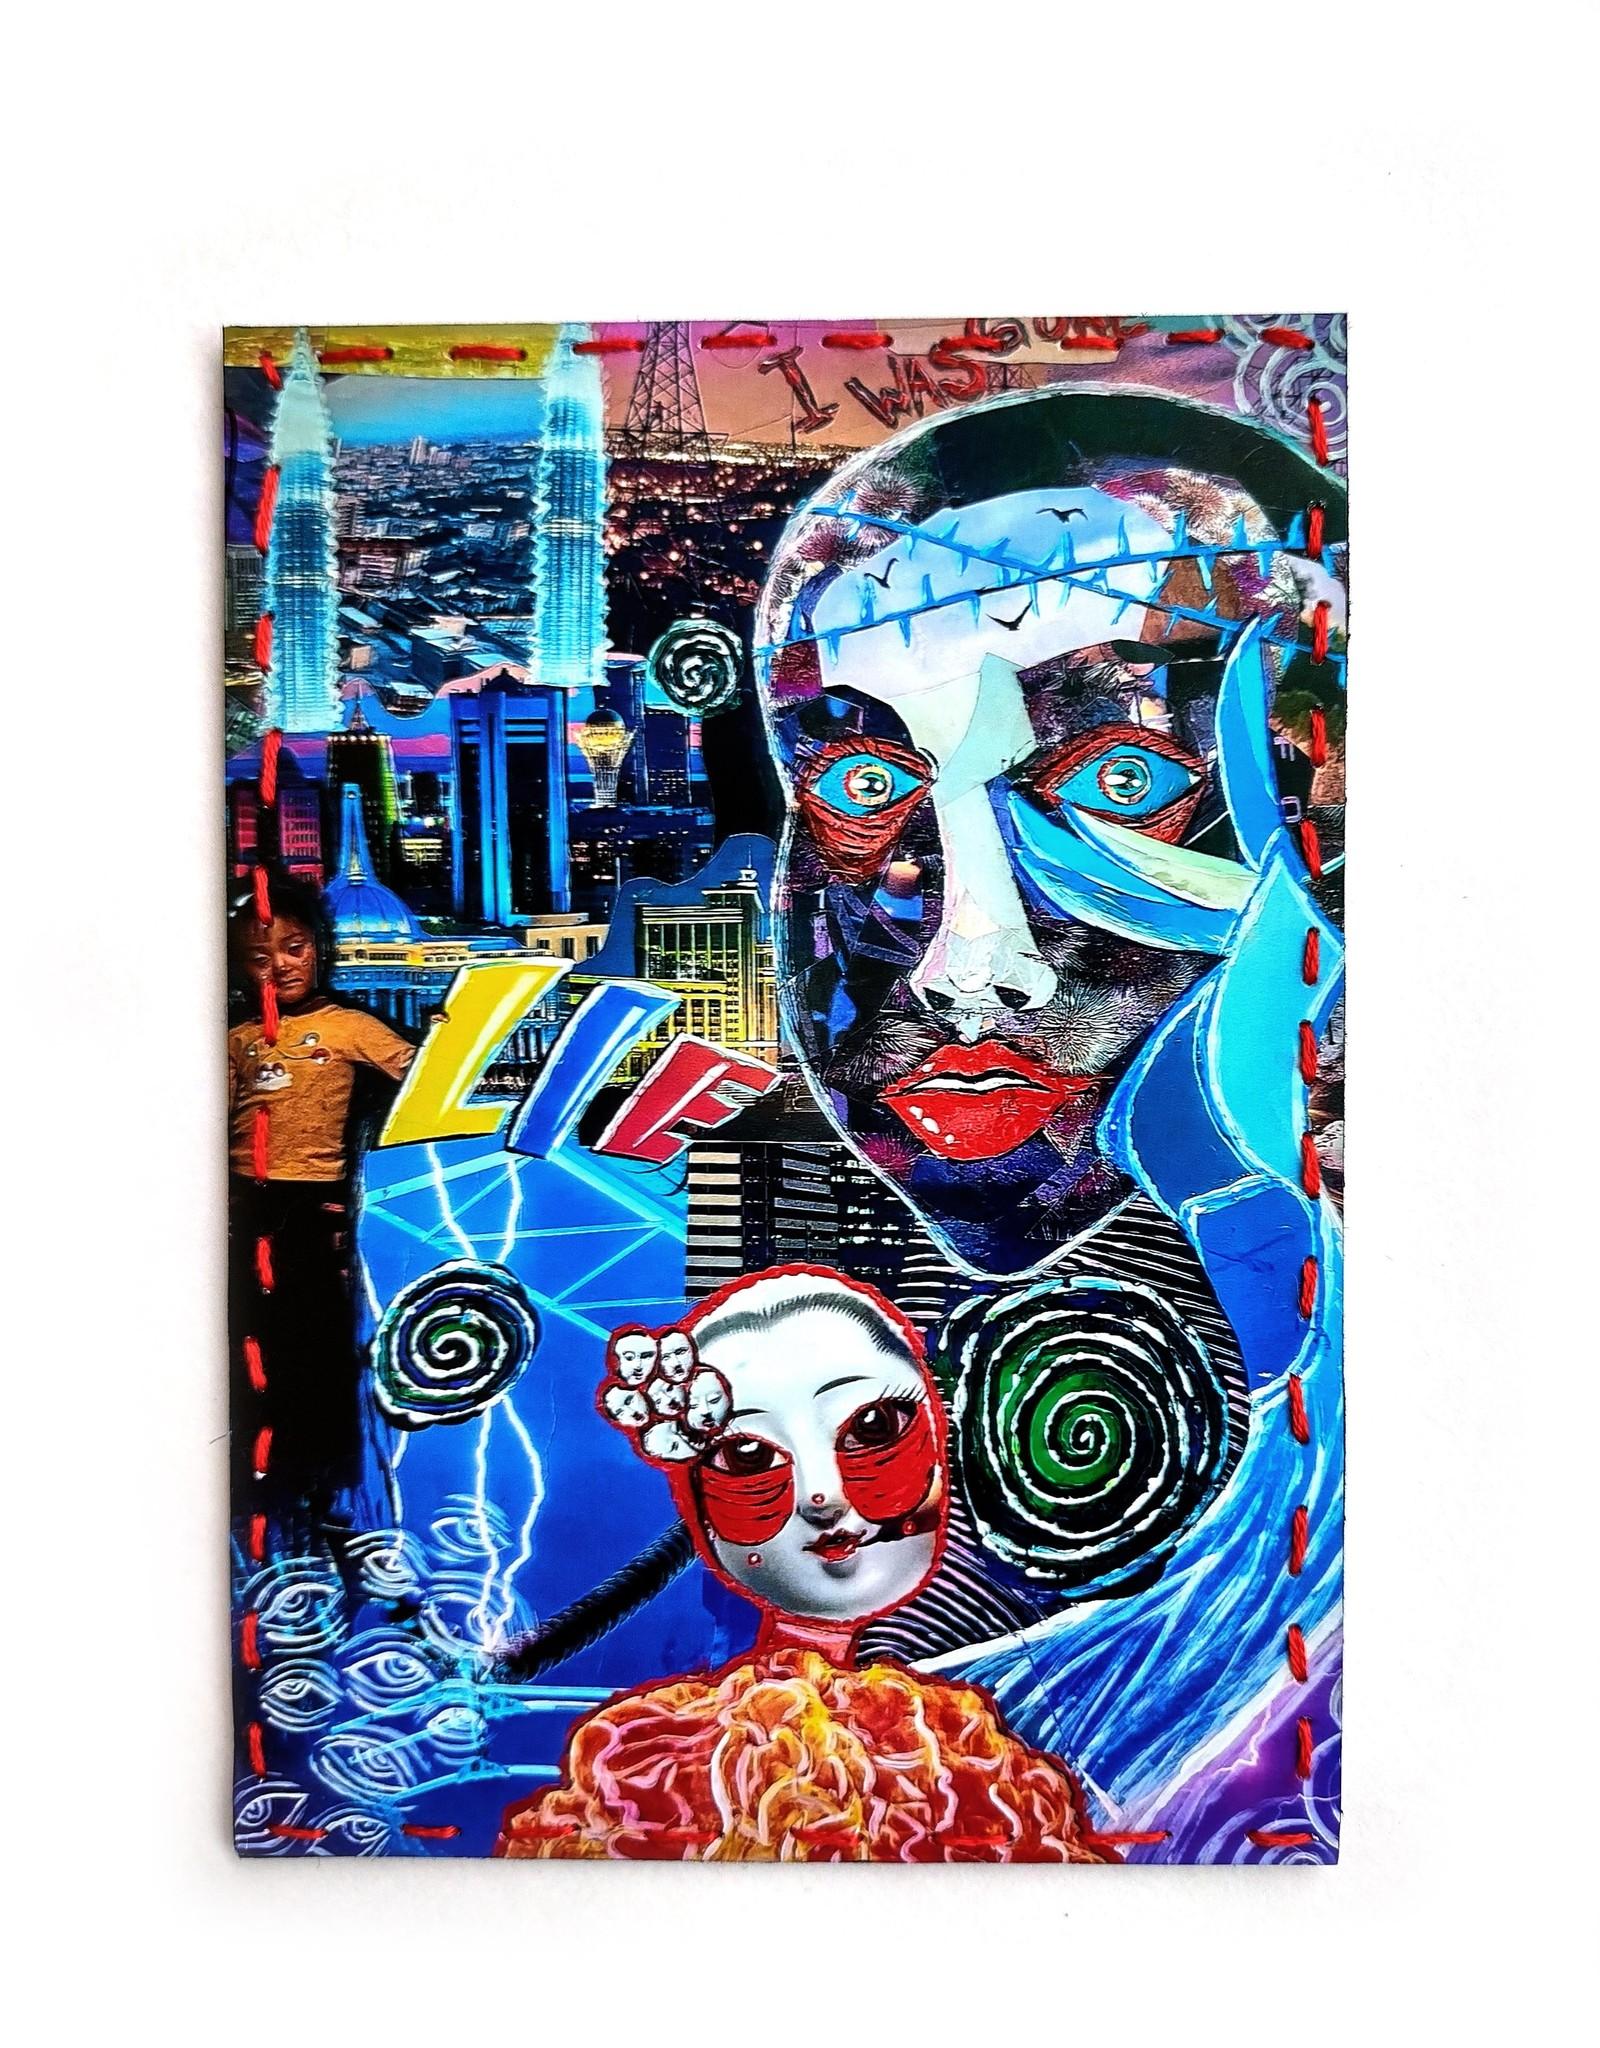 """On the Edge"" art print by Lilianna Popi"